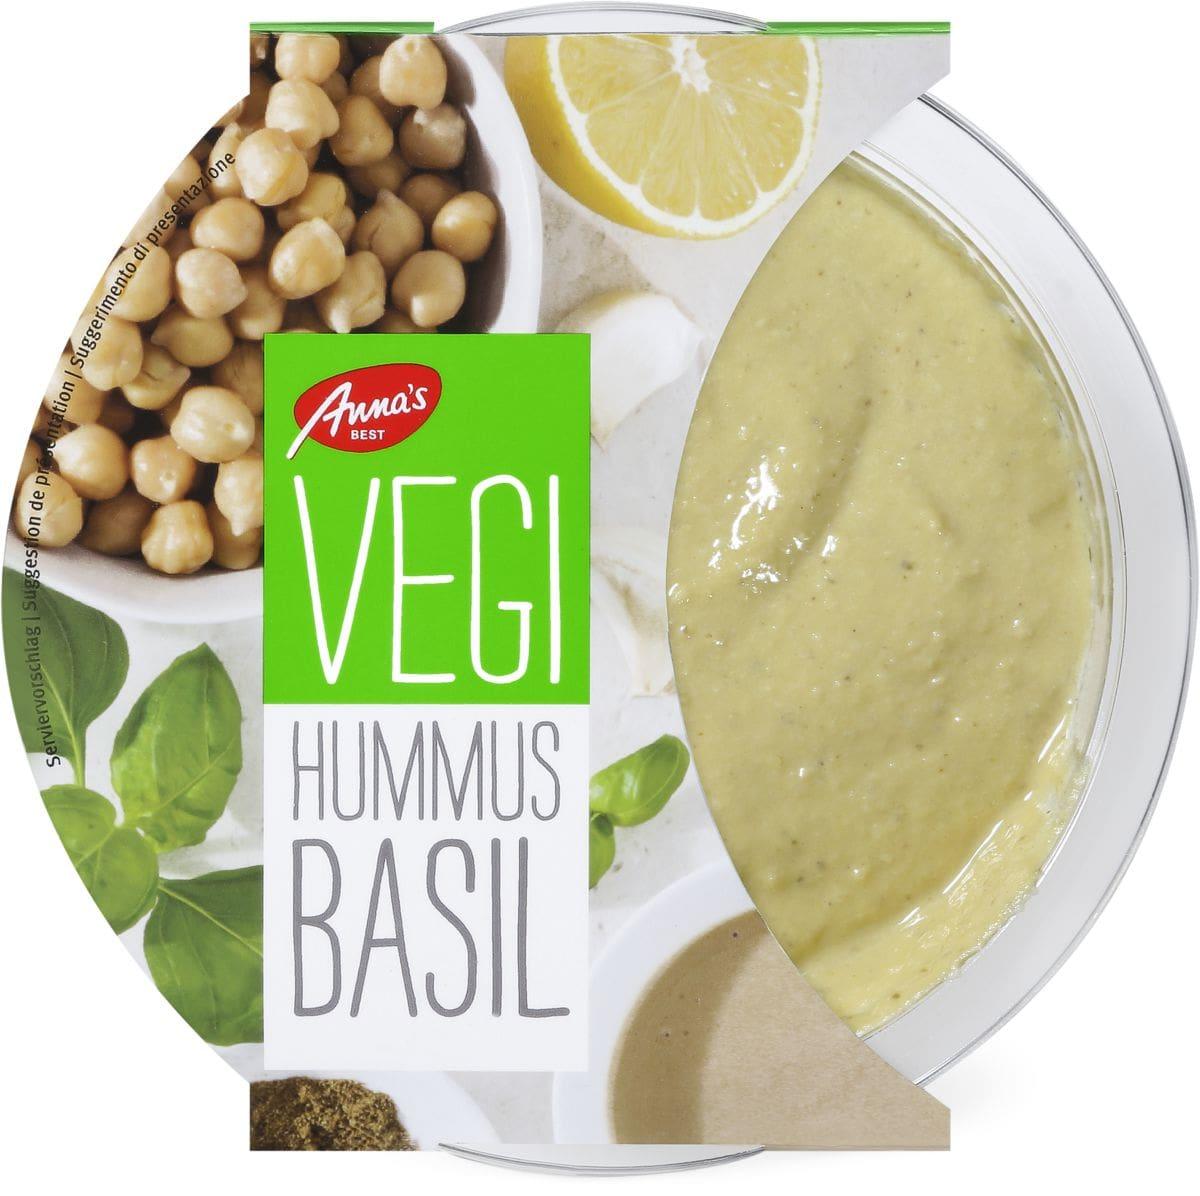 Anna's Best Vegi Hummus Basilic